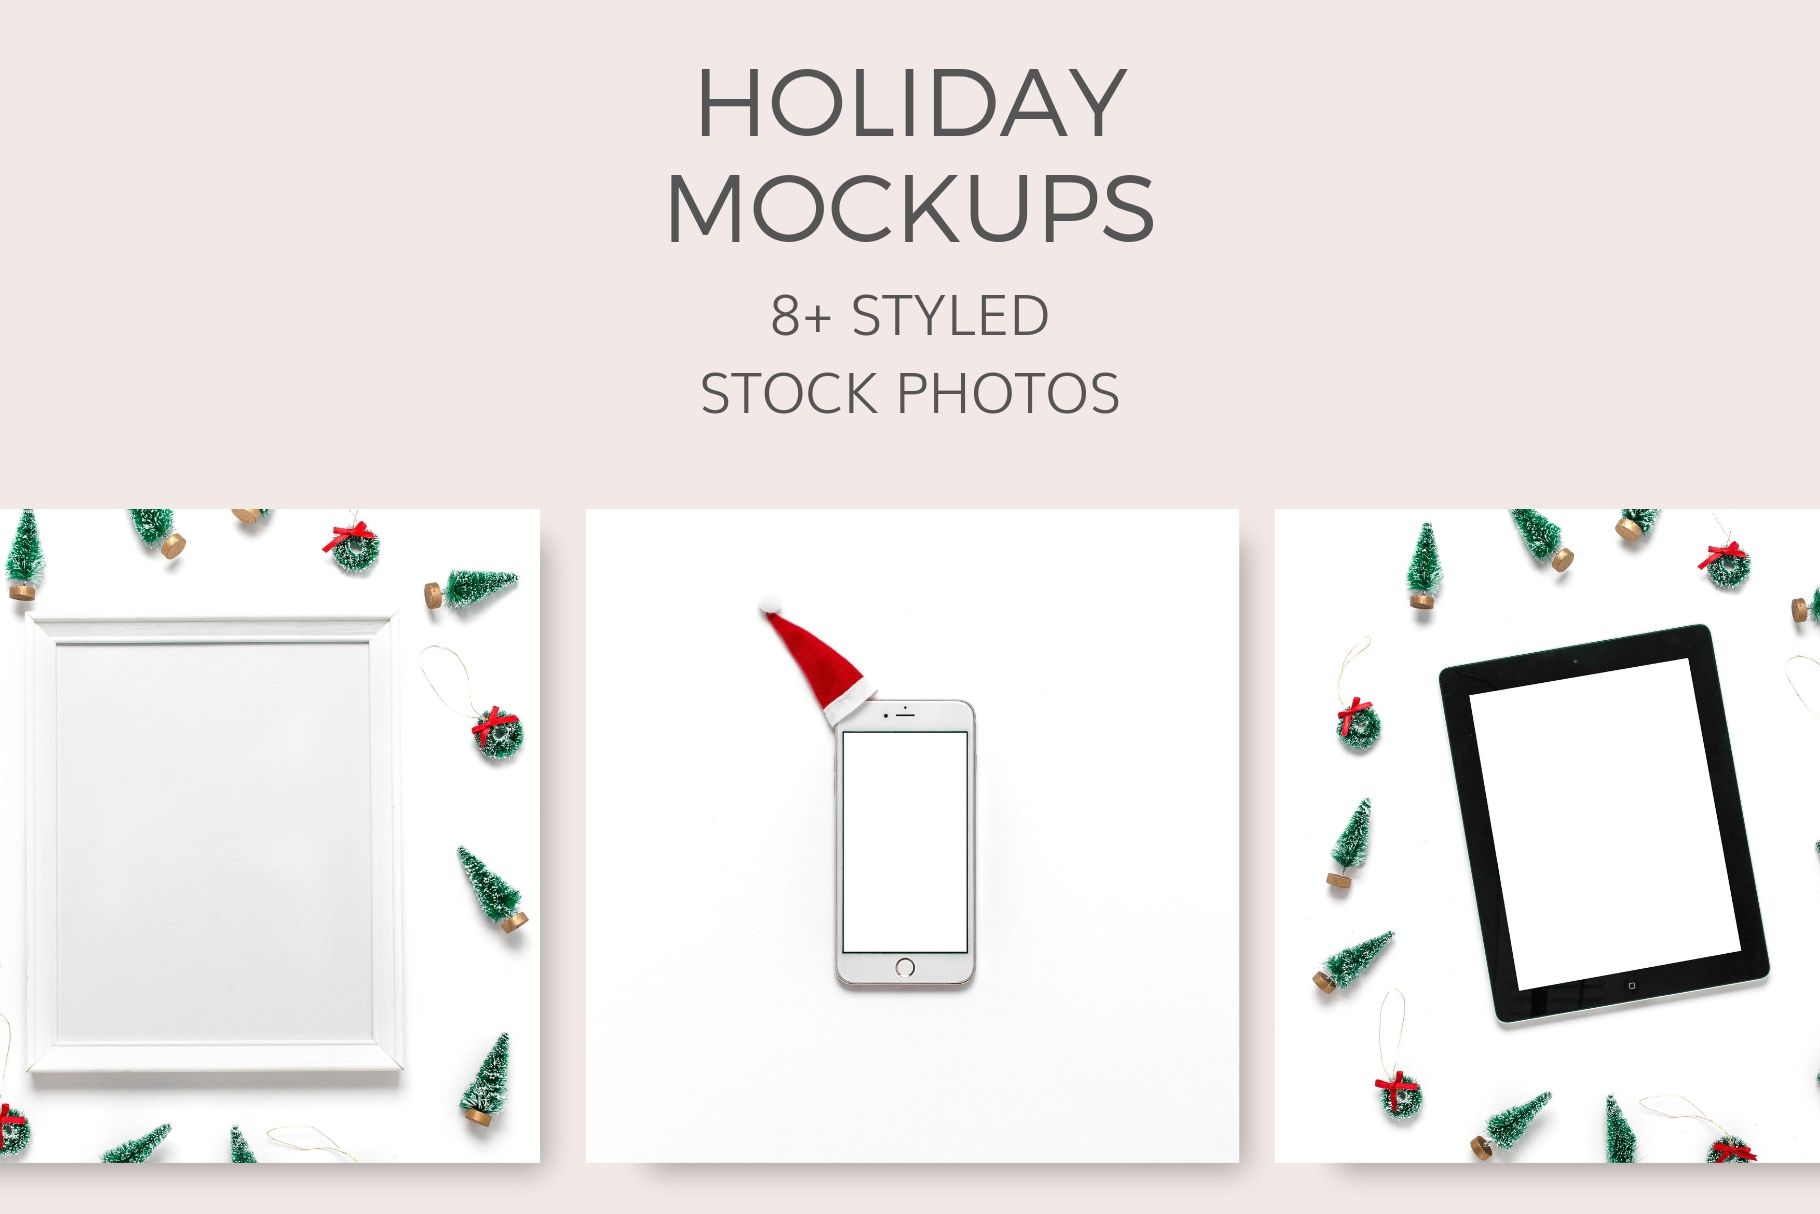 holiday_mockup_stockphotos